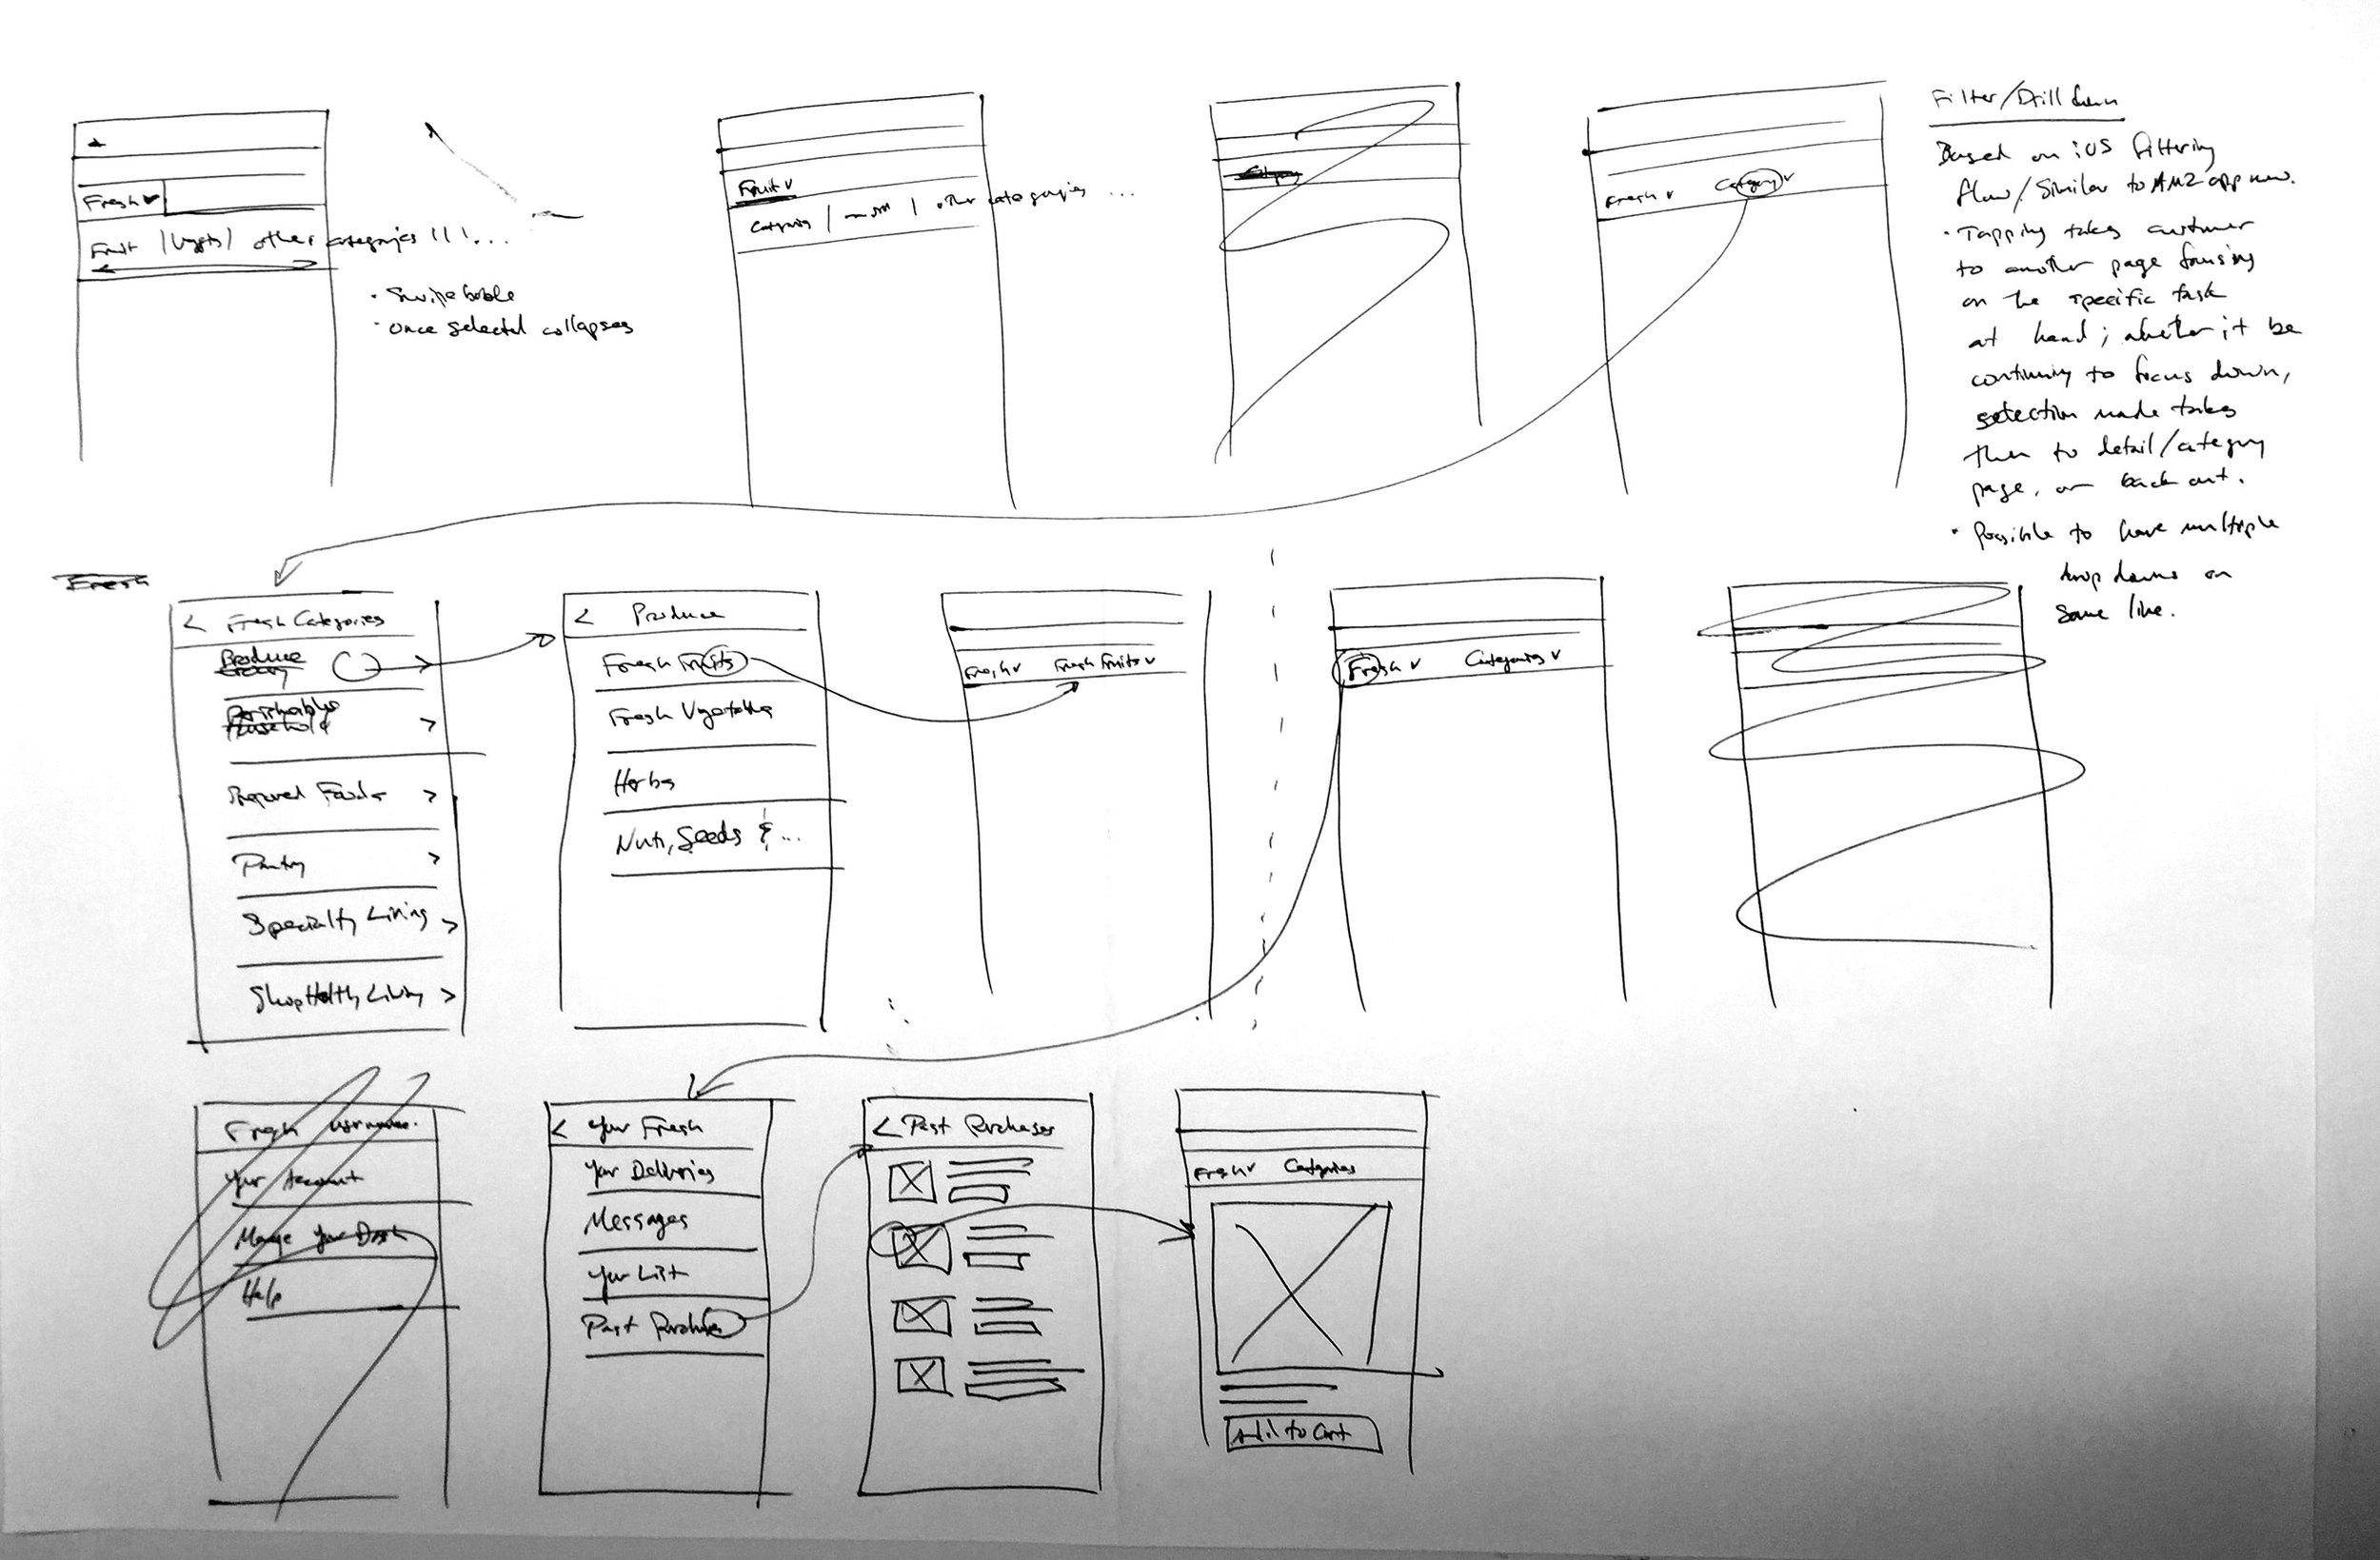 mobile_sub-nav_ideas_2.jpg